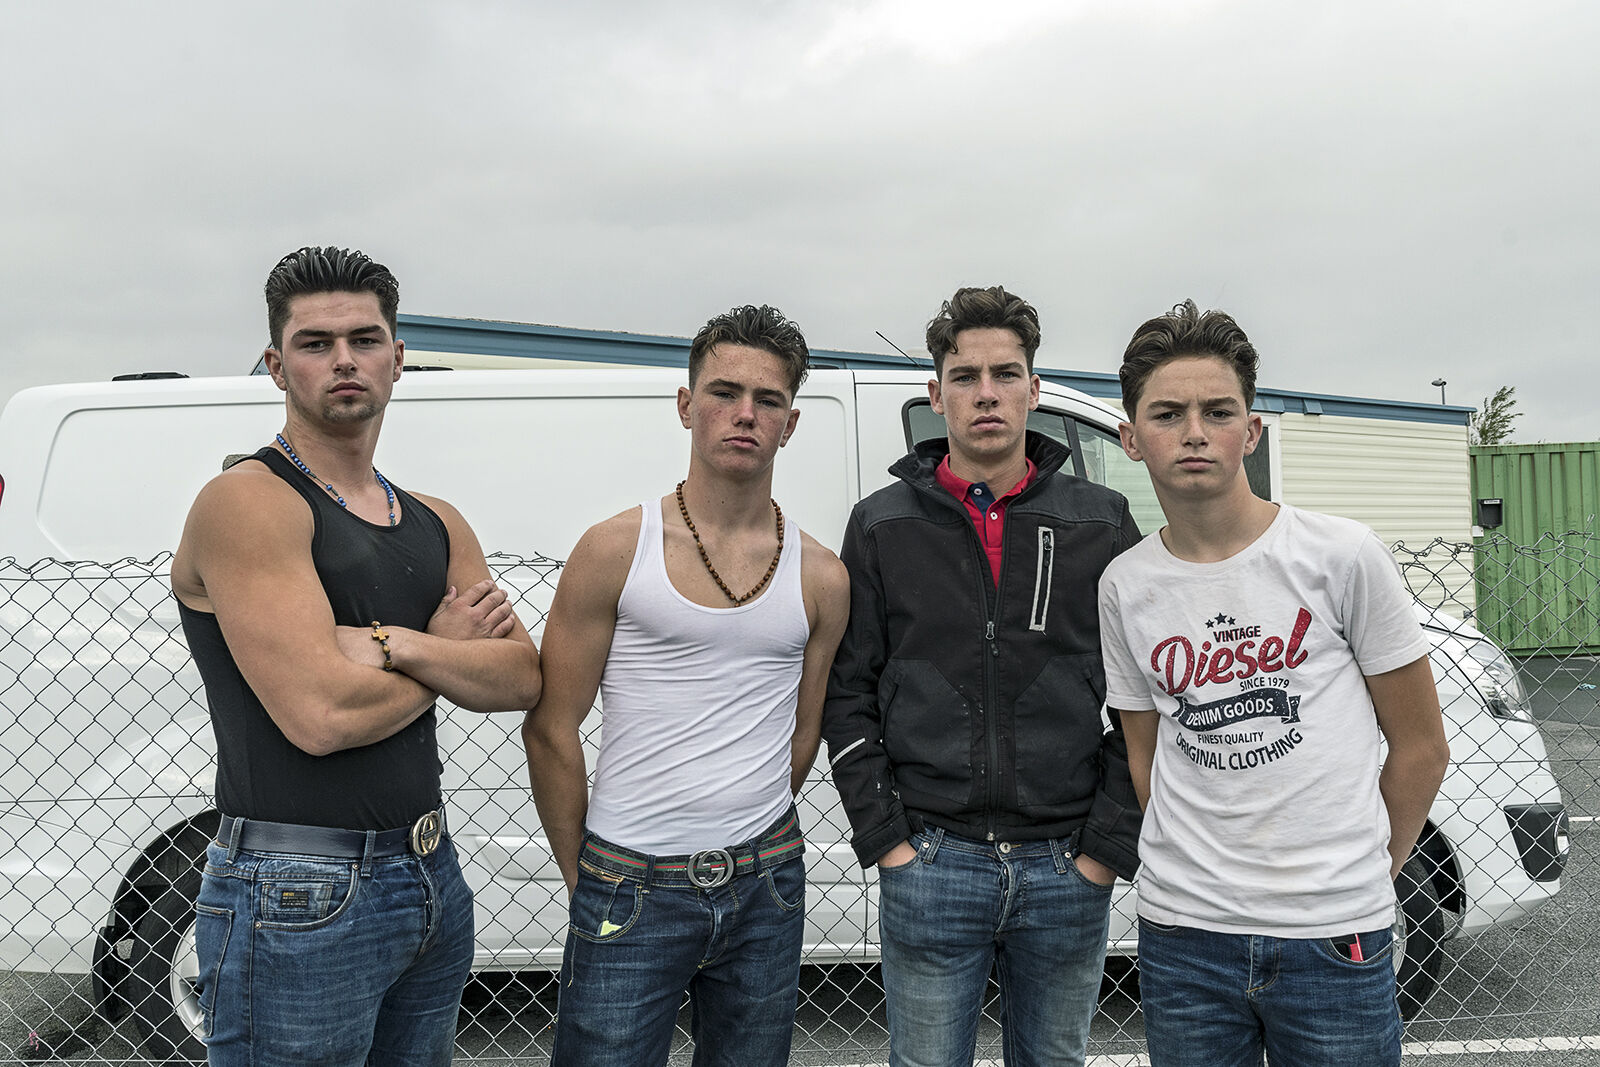 Delaney Men, Galway, Ireland 2019